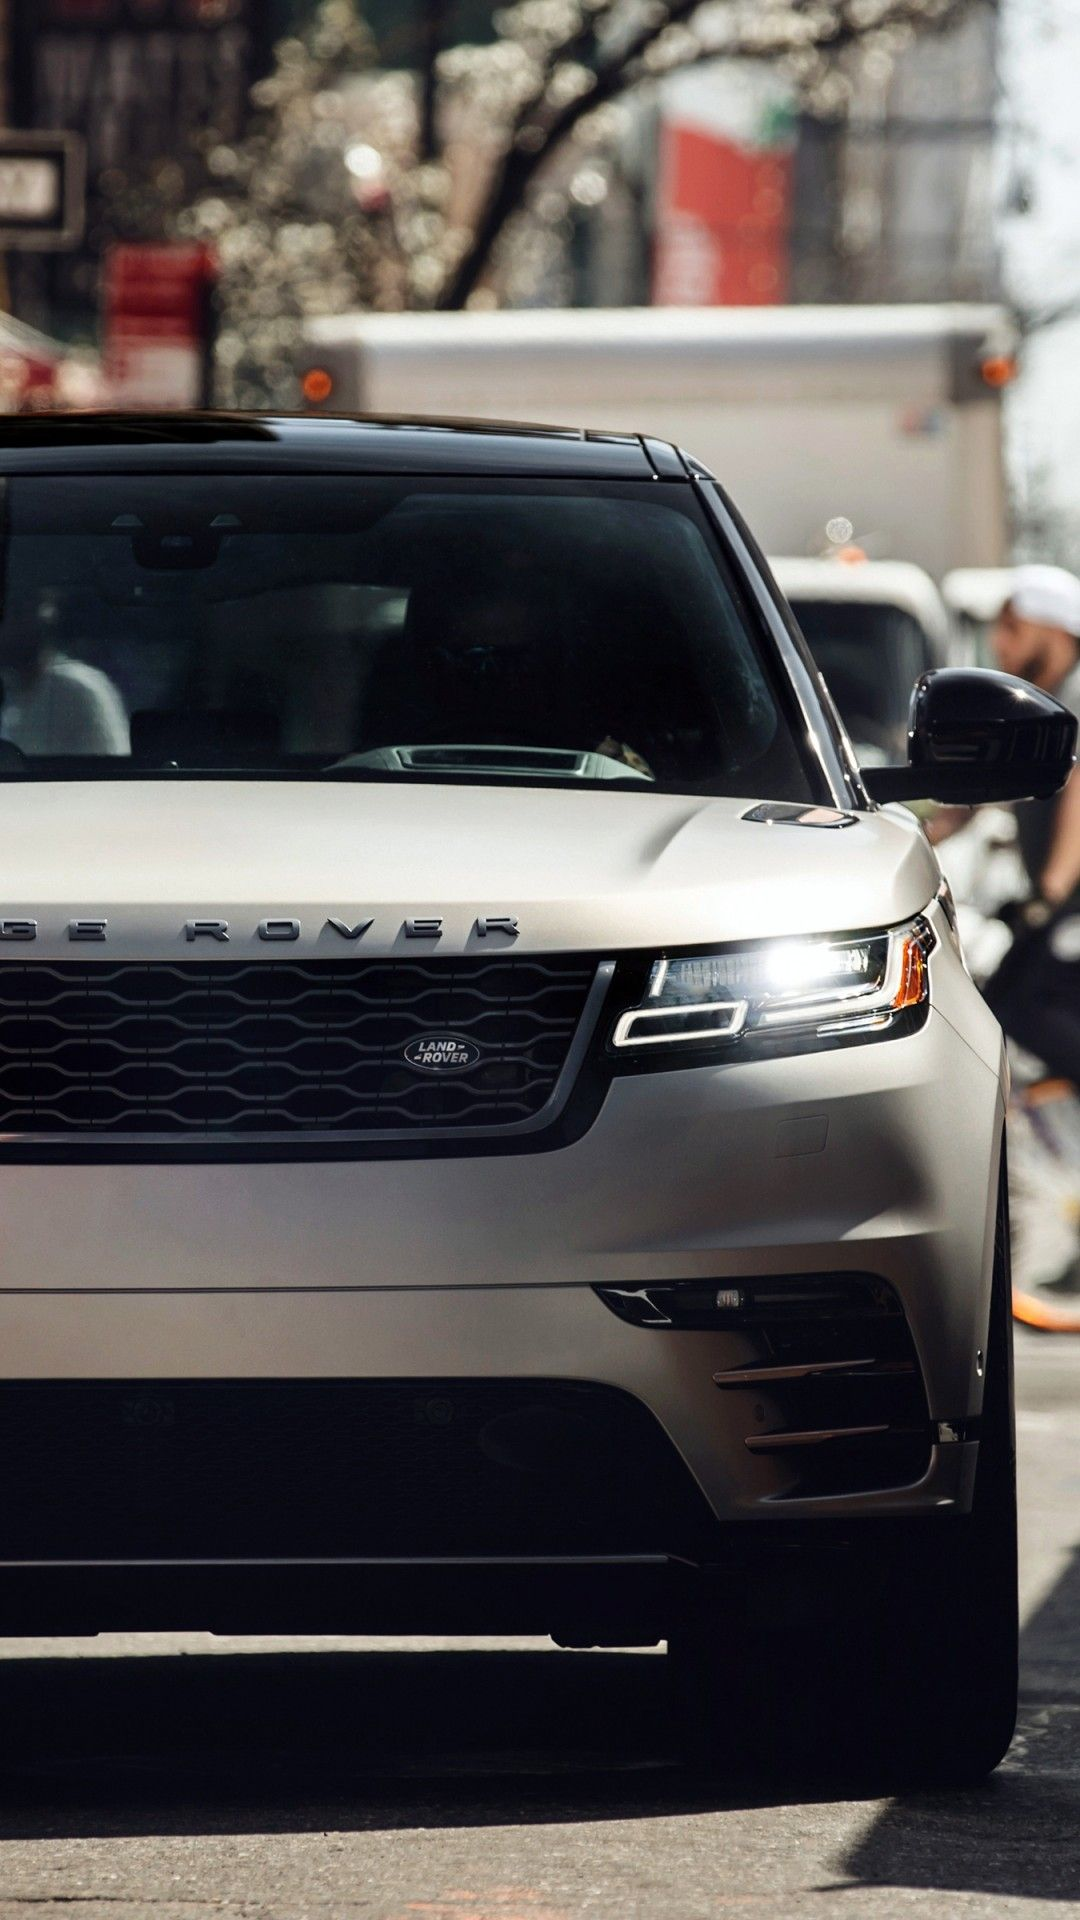 Range Rover Velar Urban People Street Suv Cars Dream Cars Range Rovers Range Rover Suv Cars